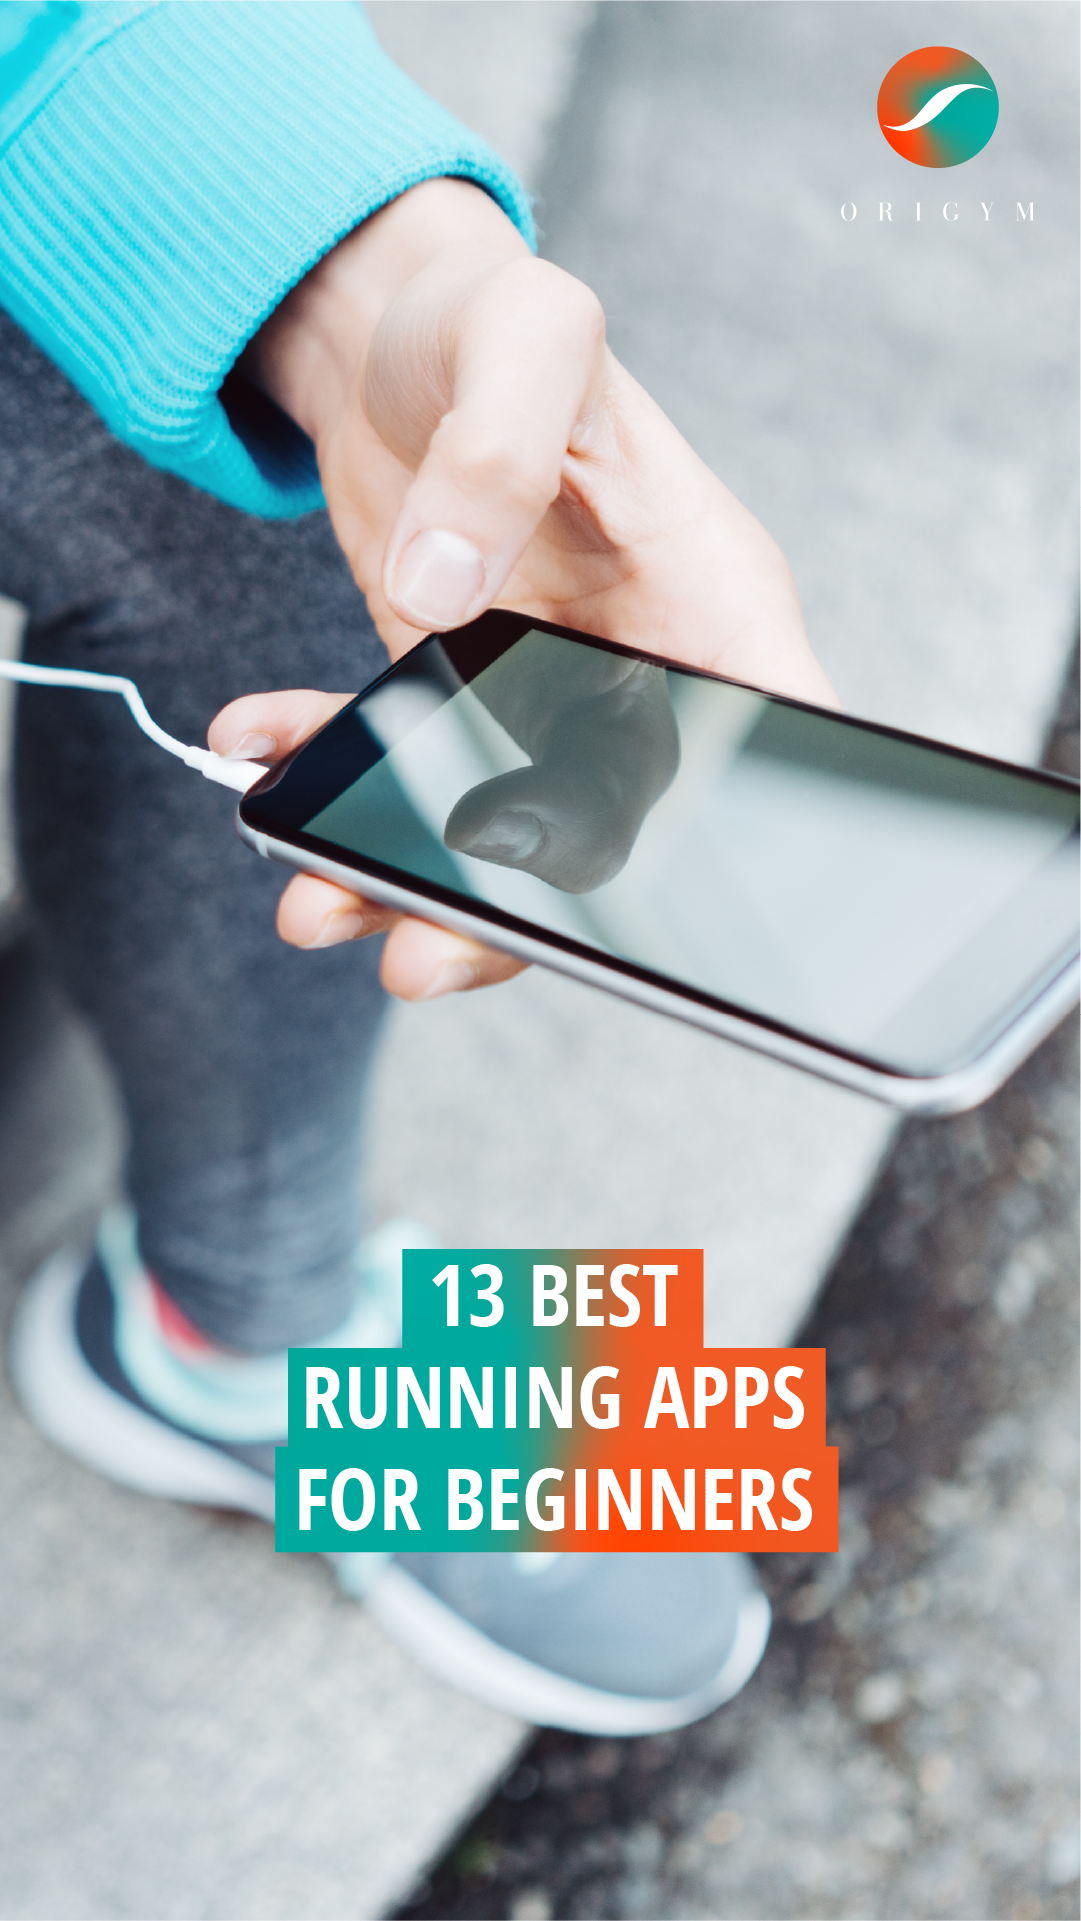 13 Best Running Apps for Beginners (2020) in 2020